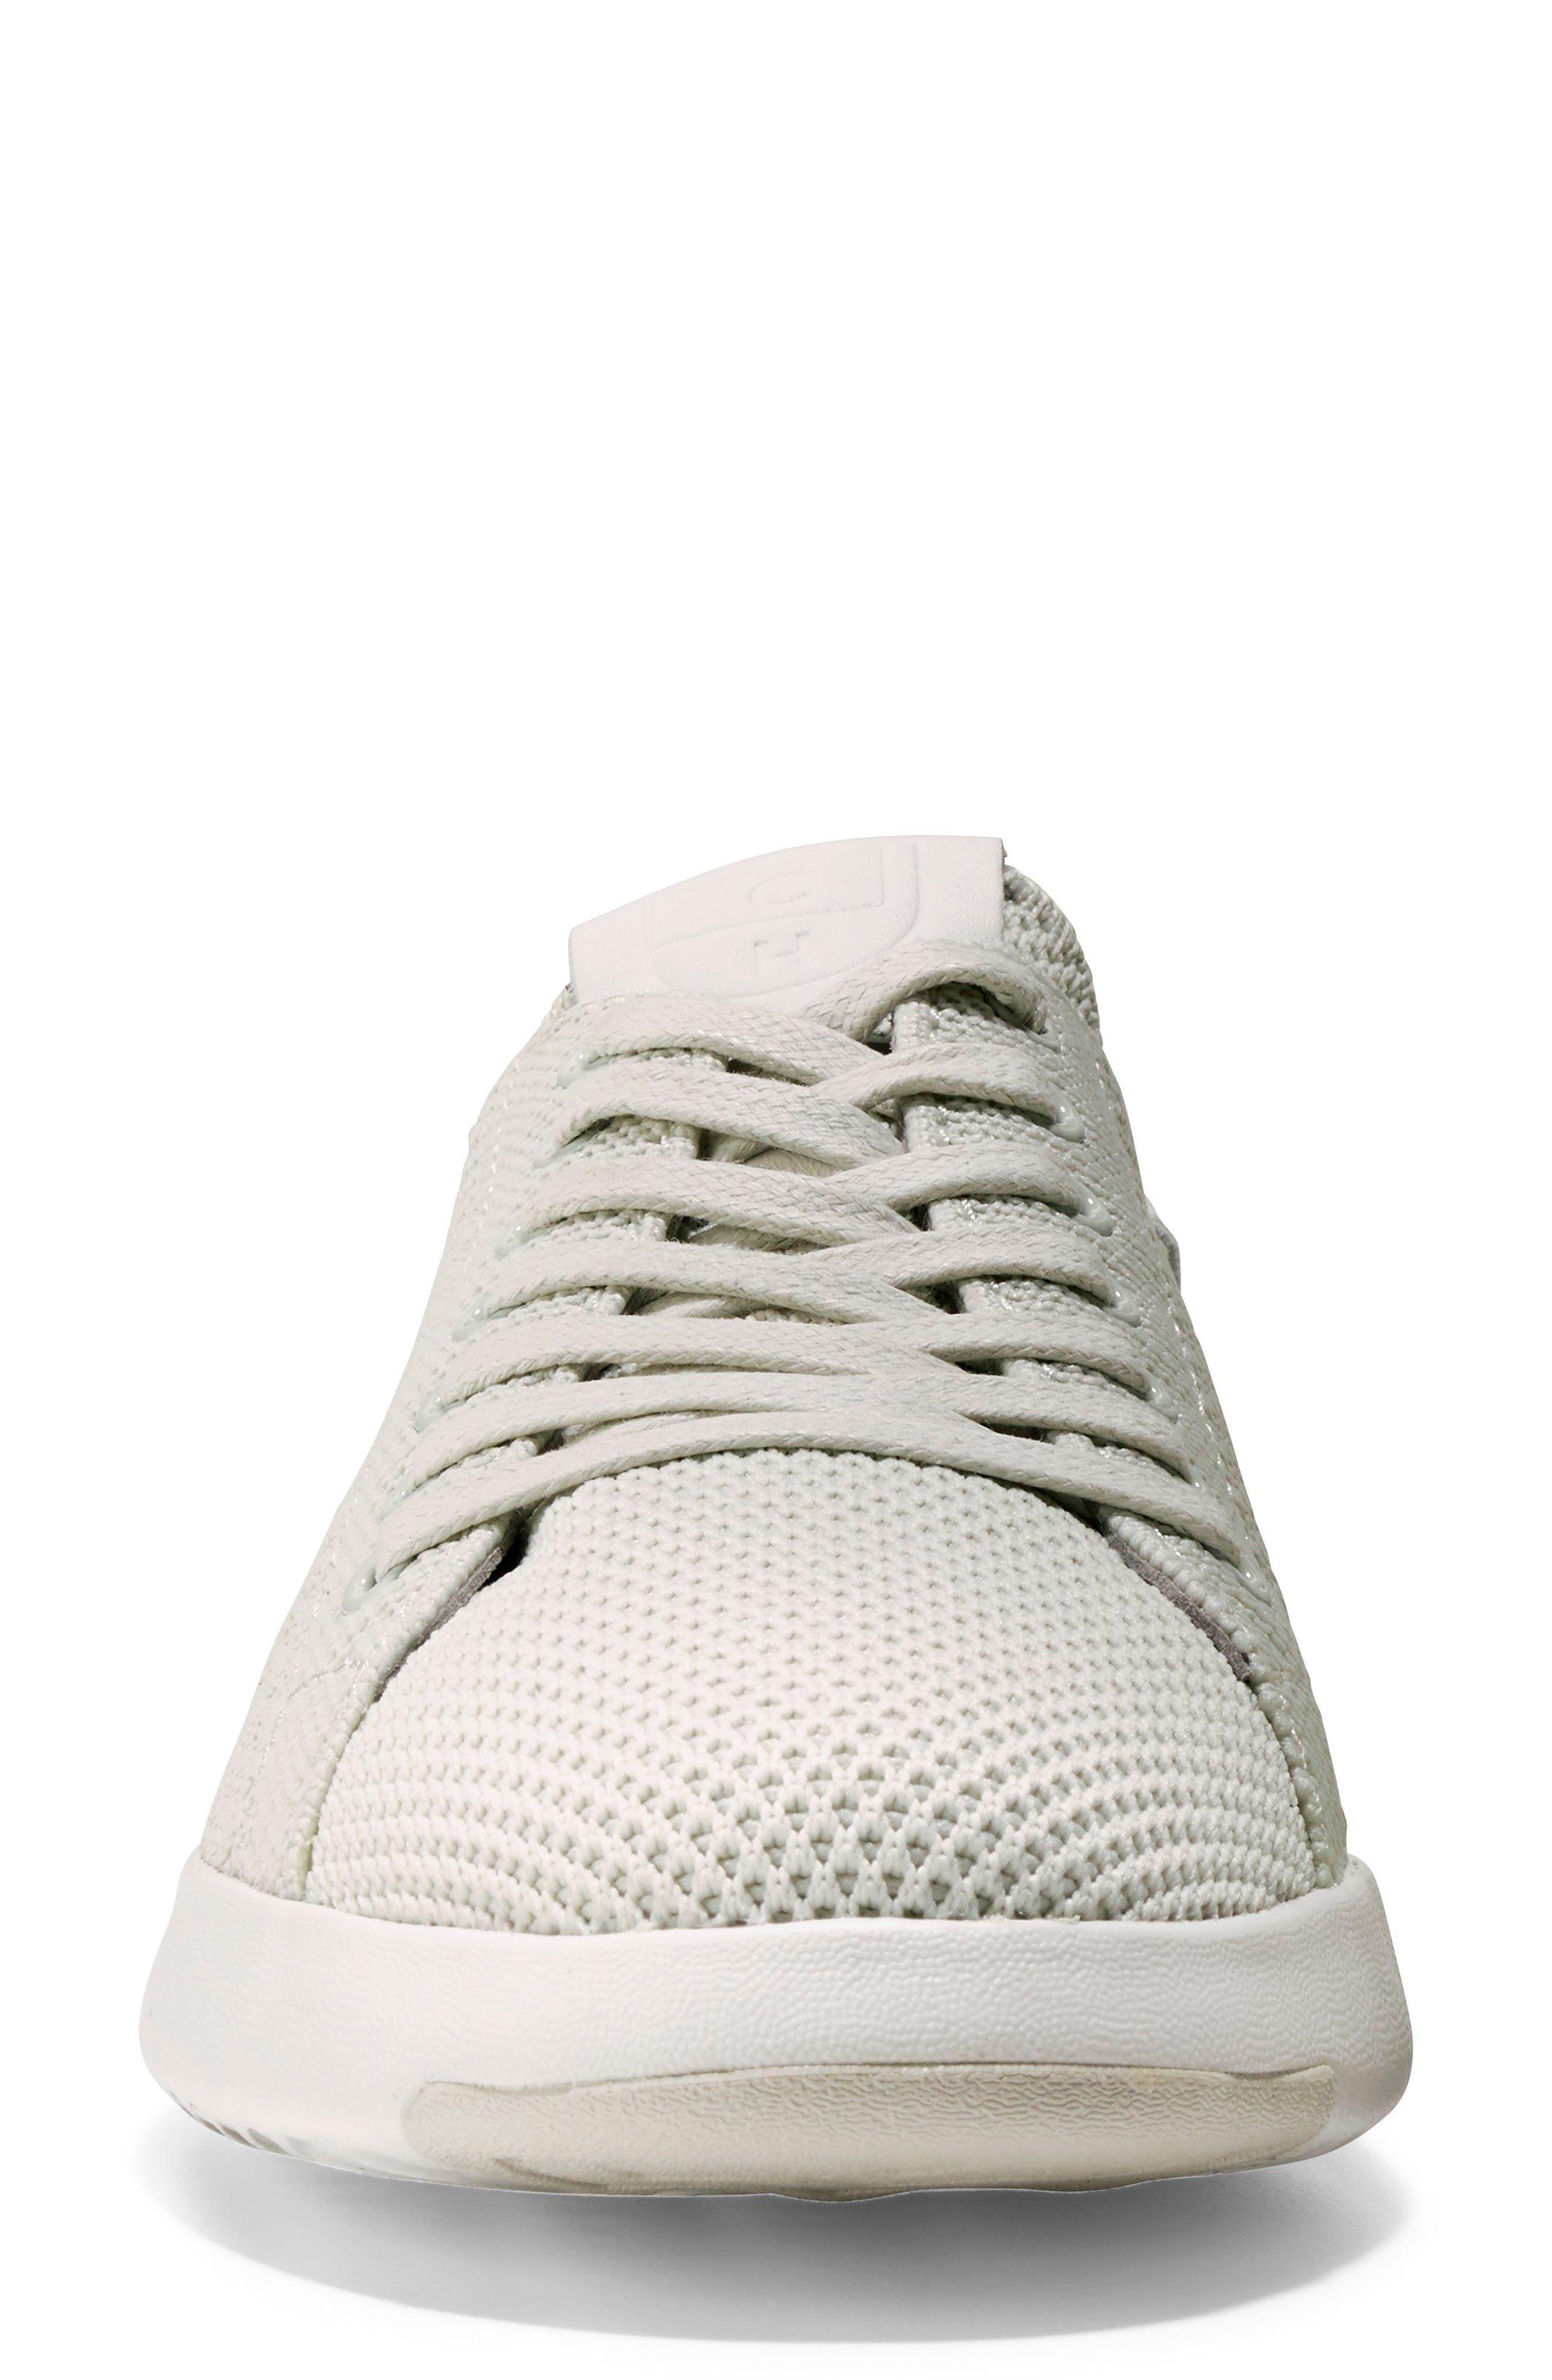 GrandPro Stitchlite Sneaker,                             Alternate thumbnail 4, color,                             CHALK FABRIC